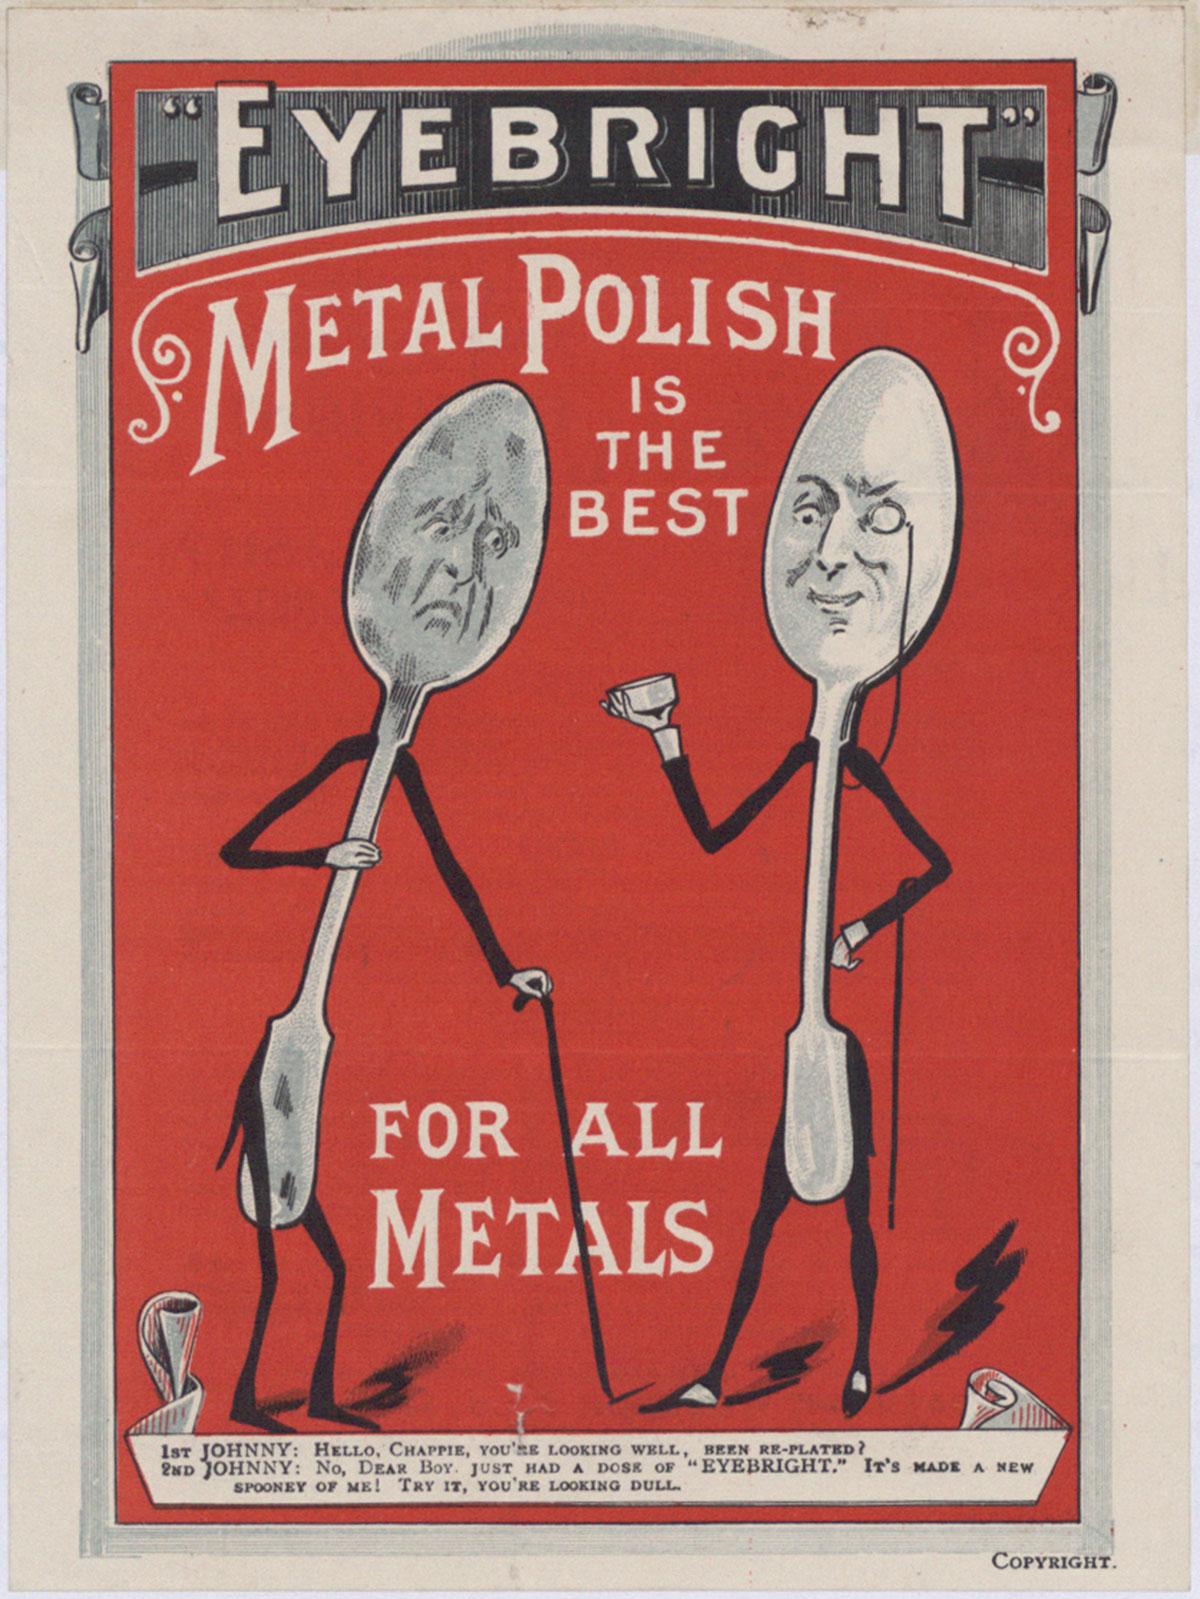 Advert for metal polish, 1897 (COPY 1/134 f.107)